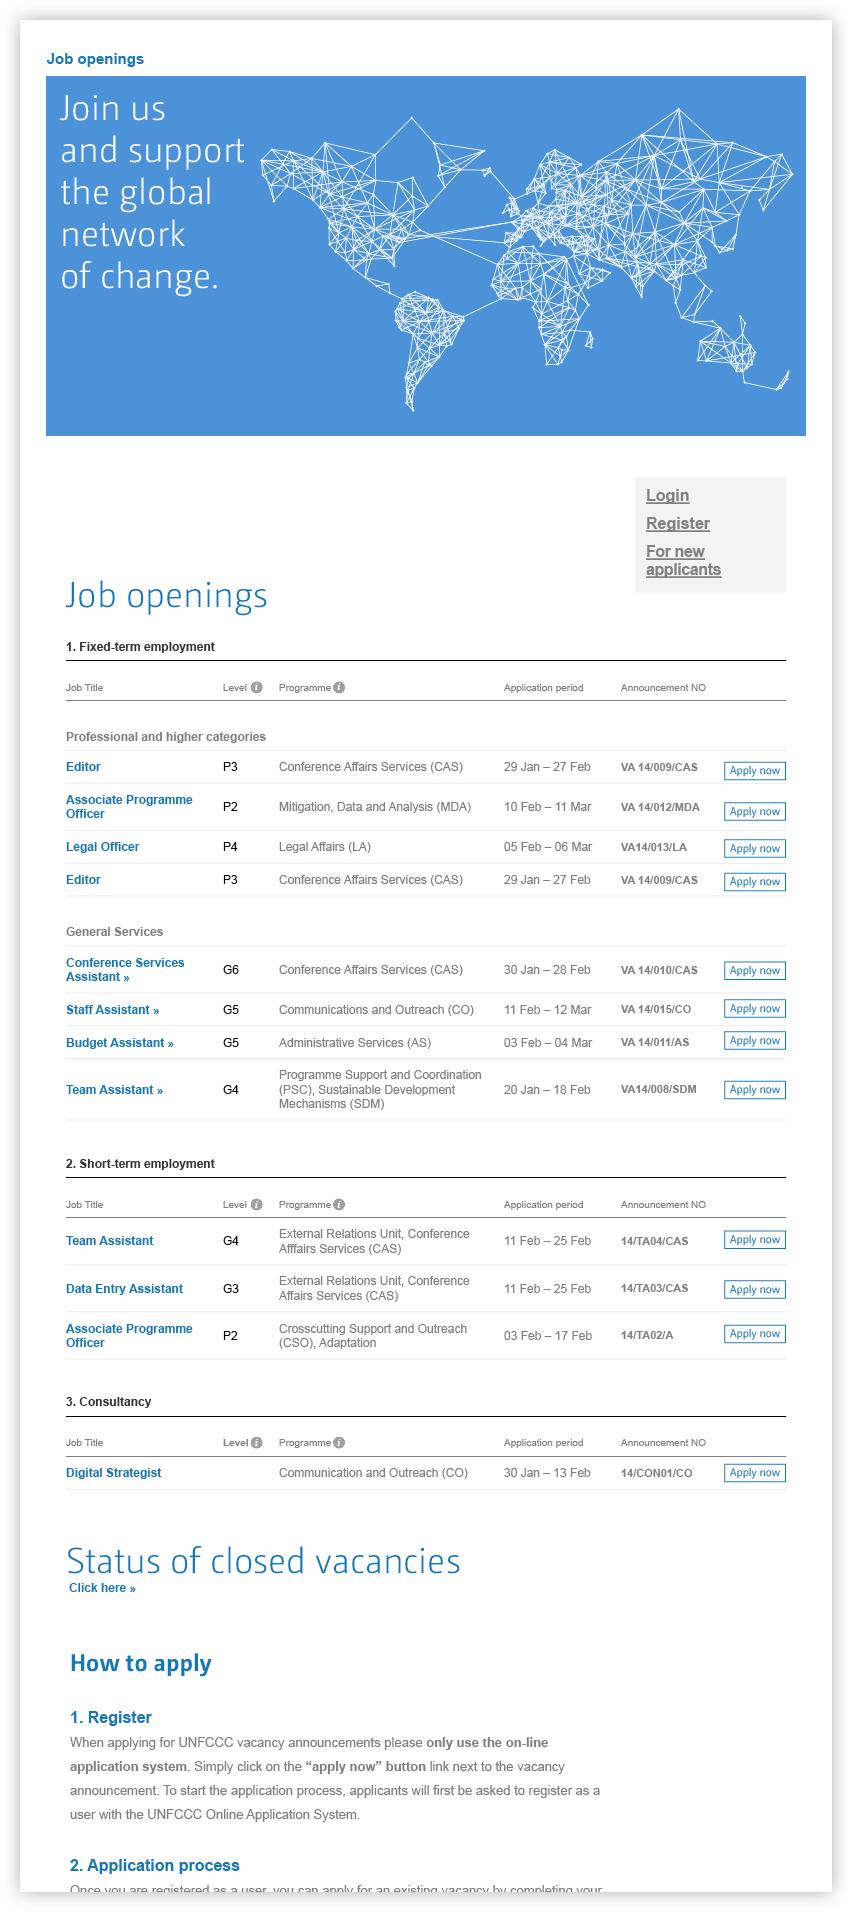 employer_branding_website_02